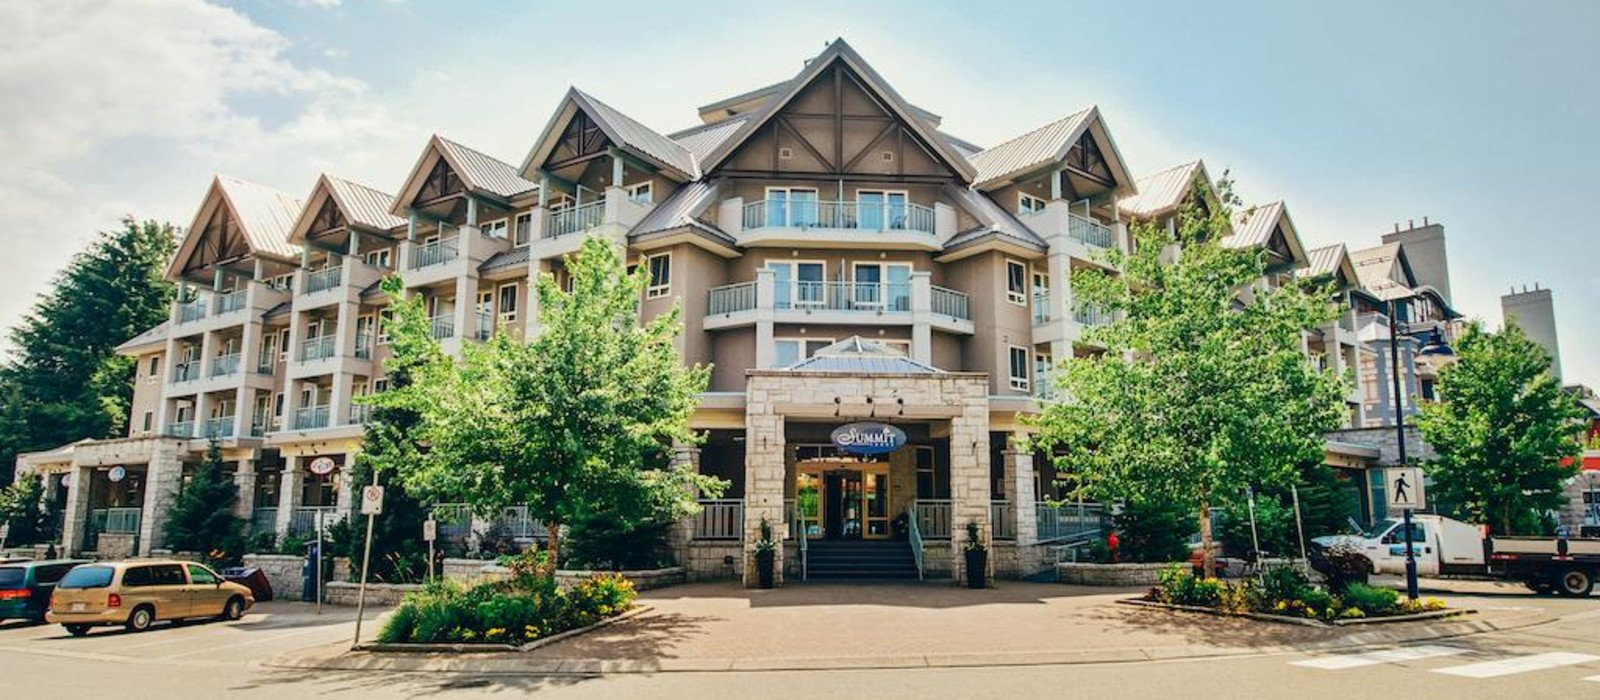 Hotel Summit Lodge Boutique  Canada